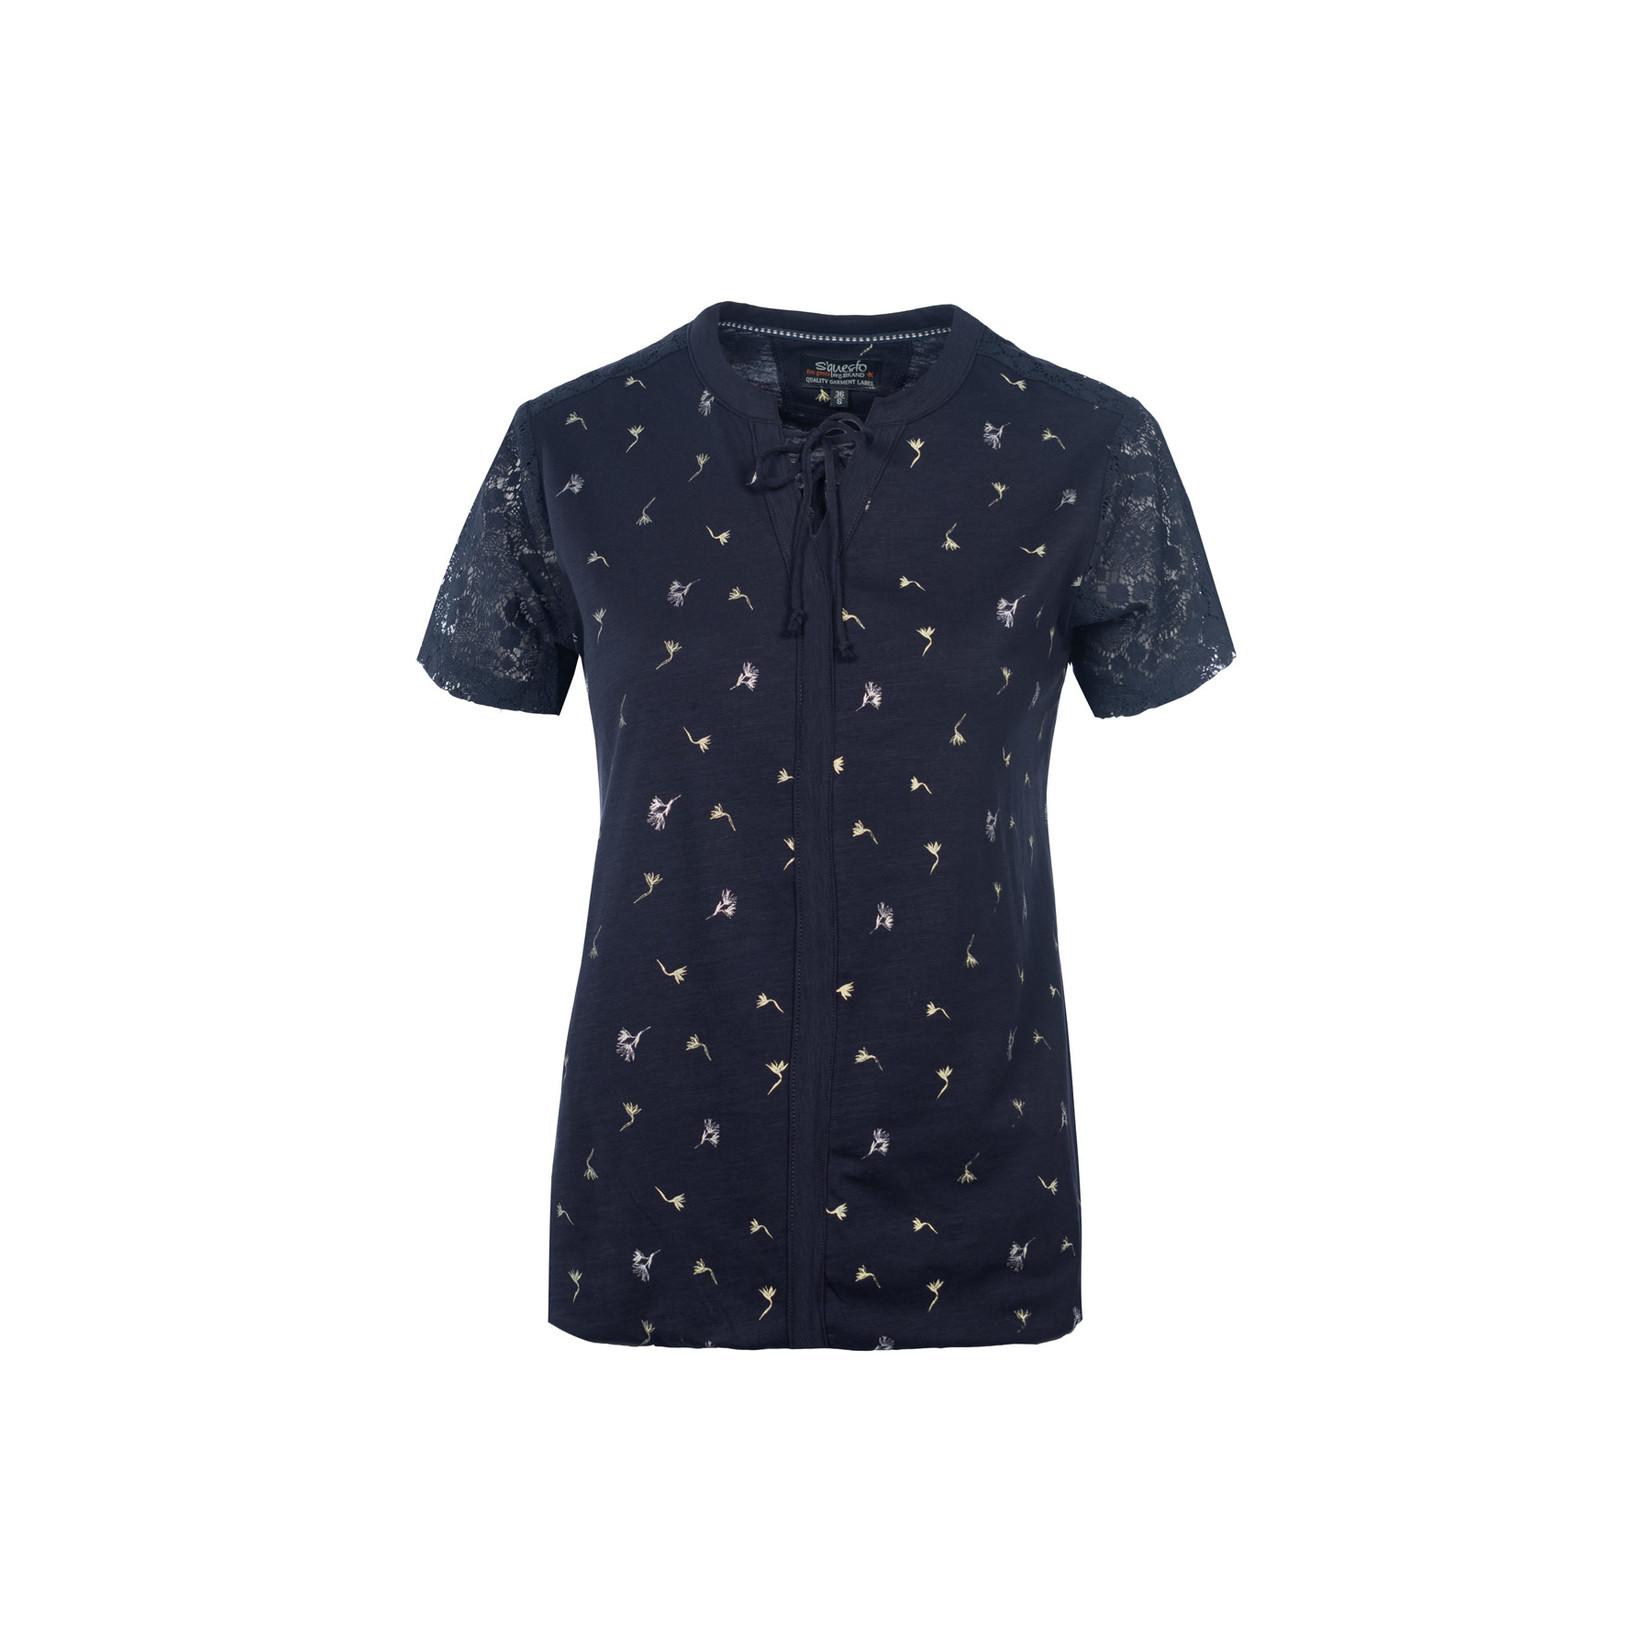 Soquesto Soquesto Shirt ½ 6180-501823 navy